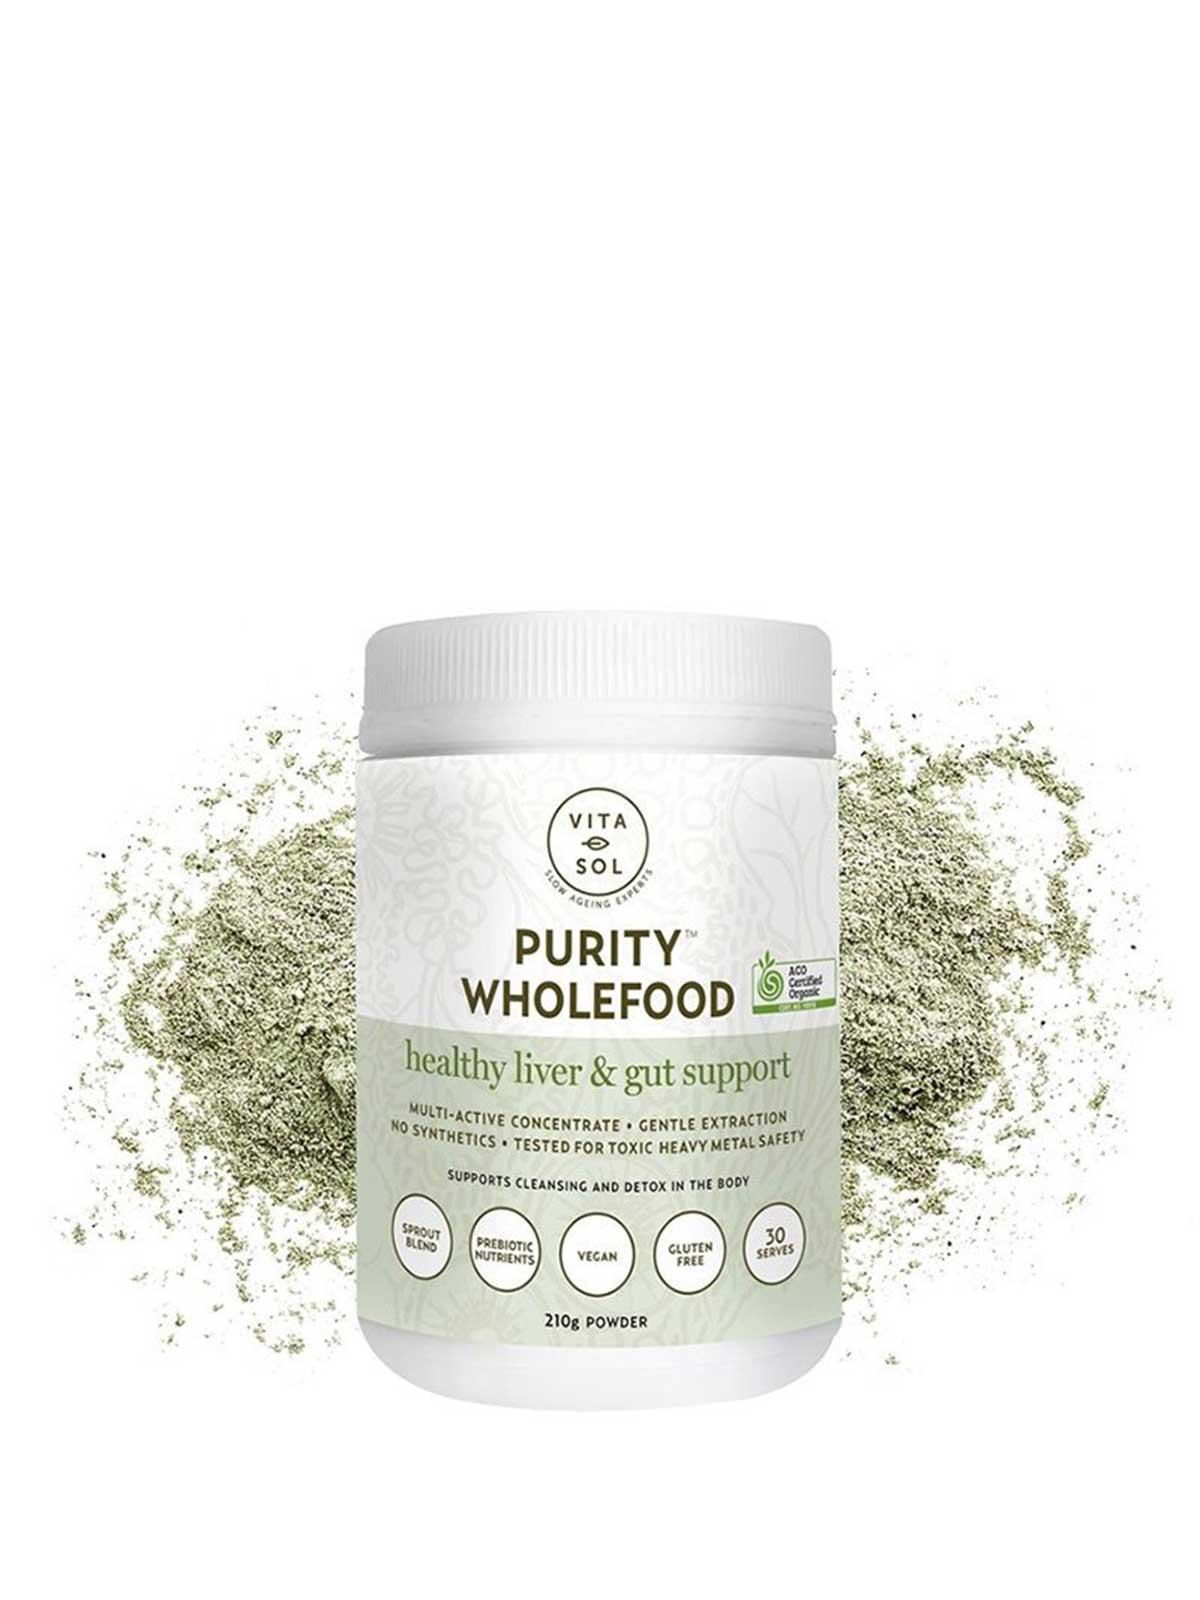 Vita Sol Purity Wholefood Powder